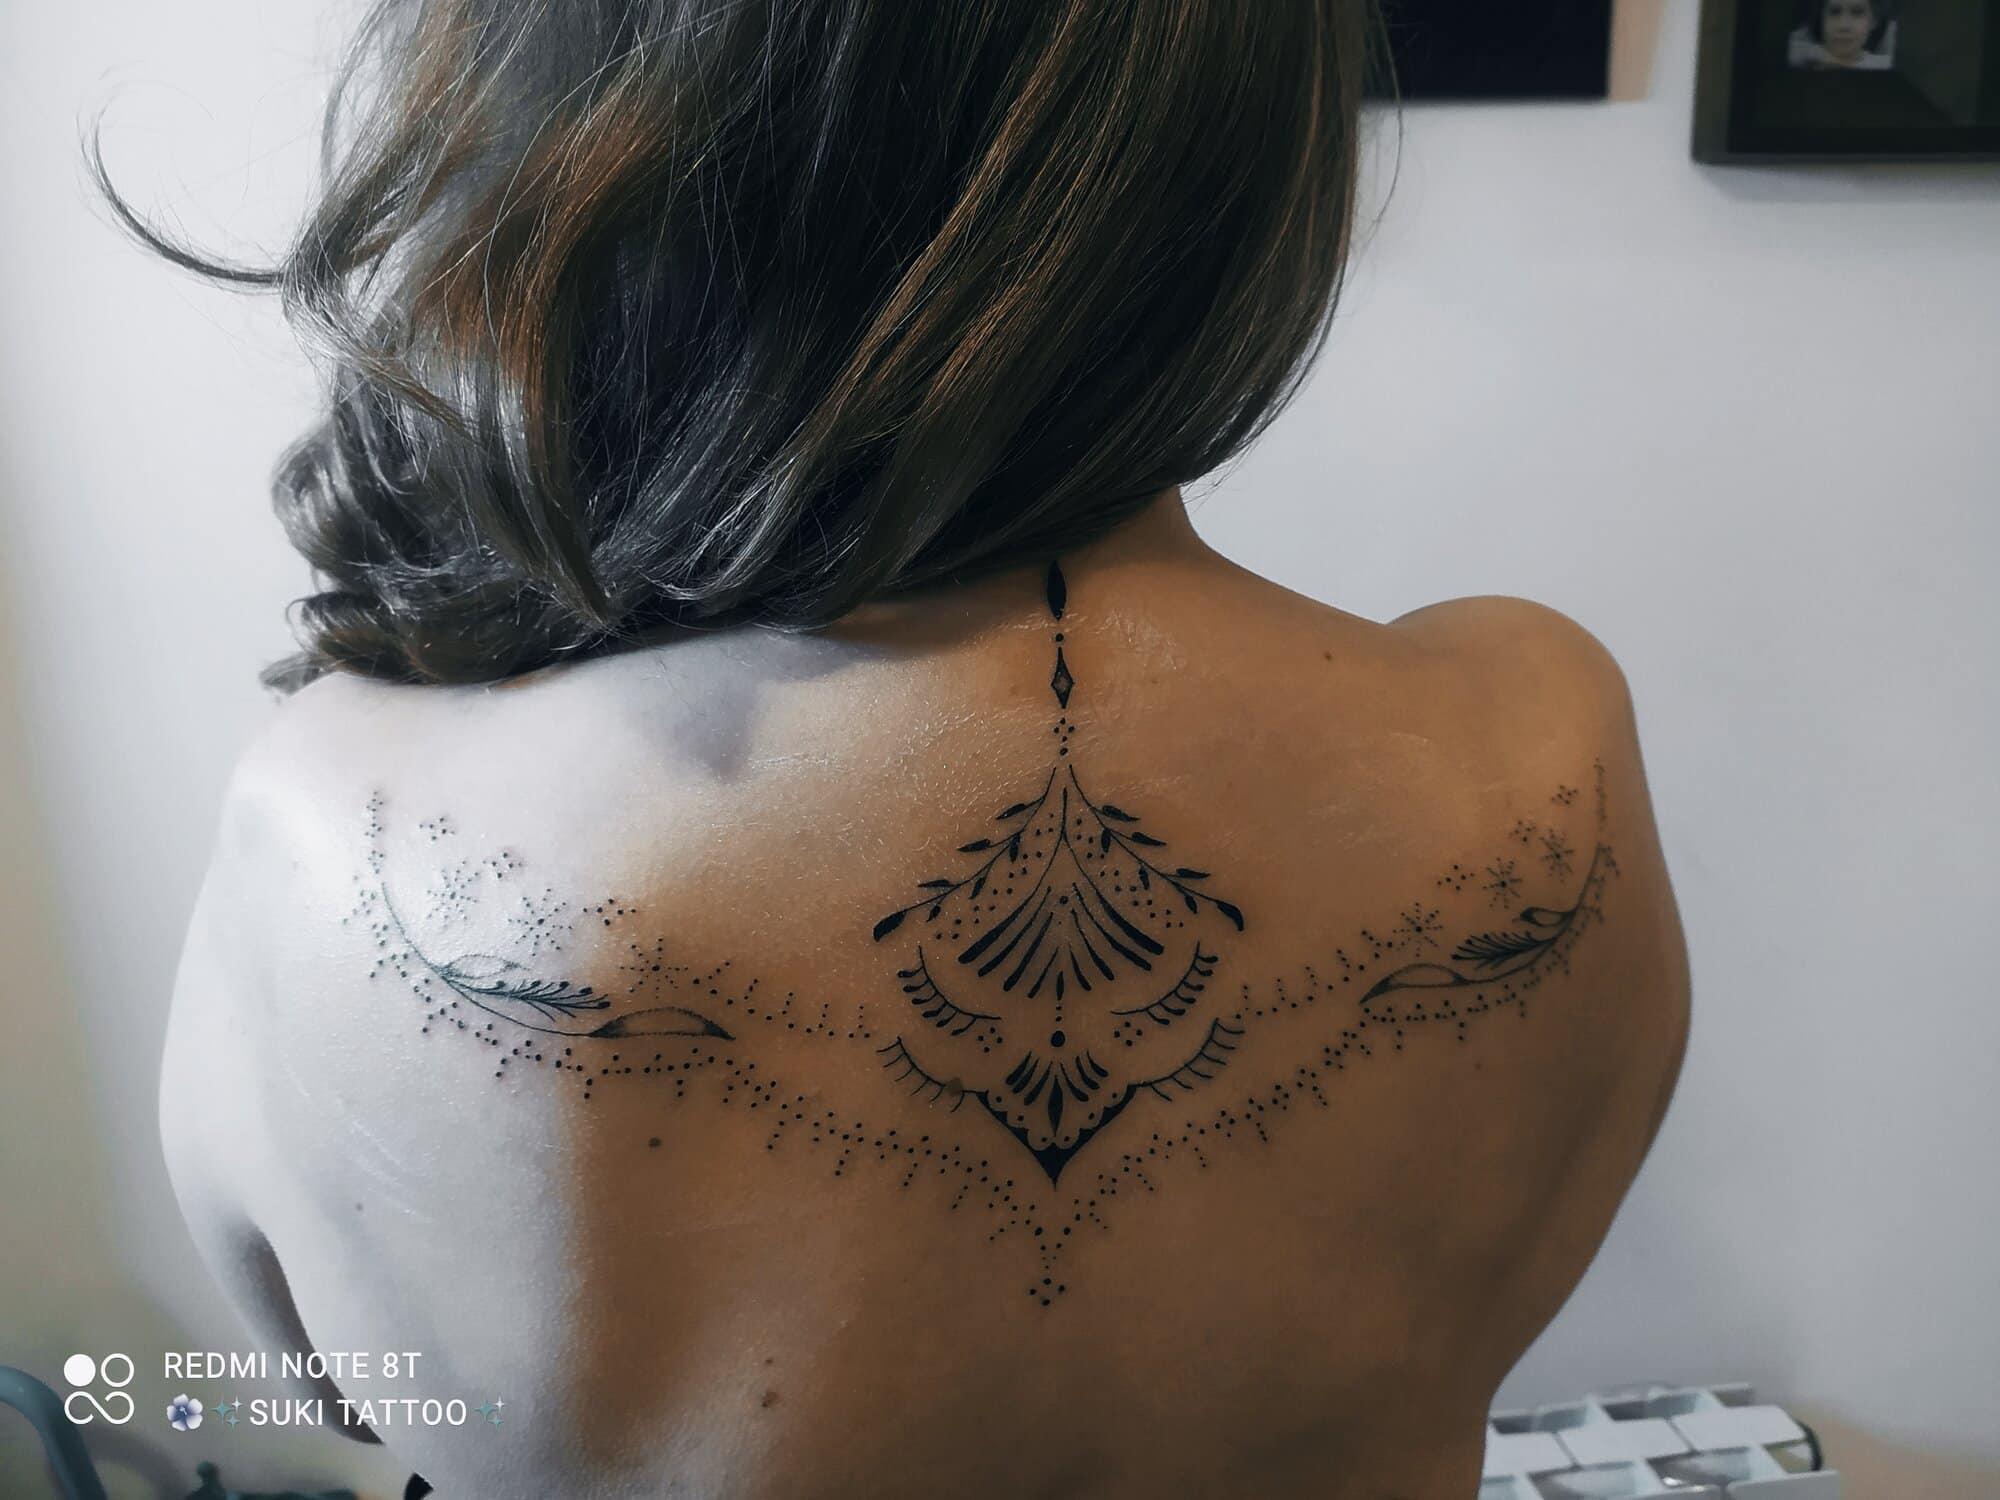 laura-suarez-tattoo-artist-up-back